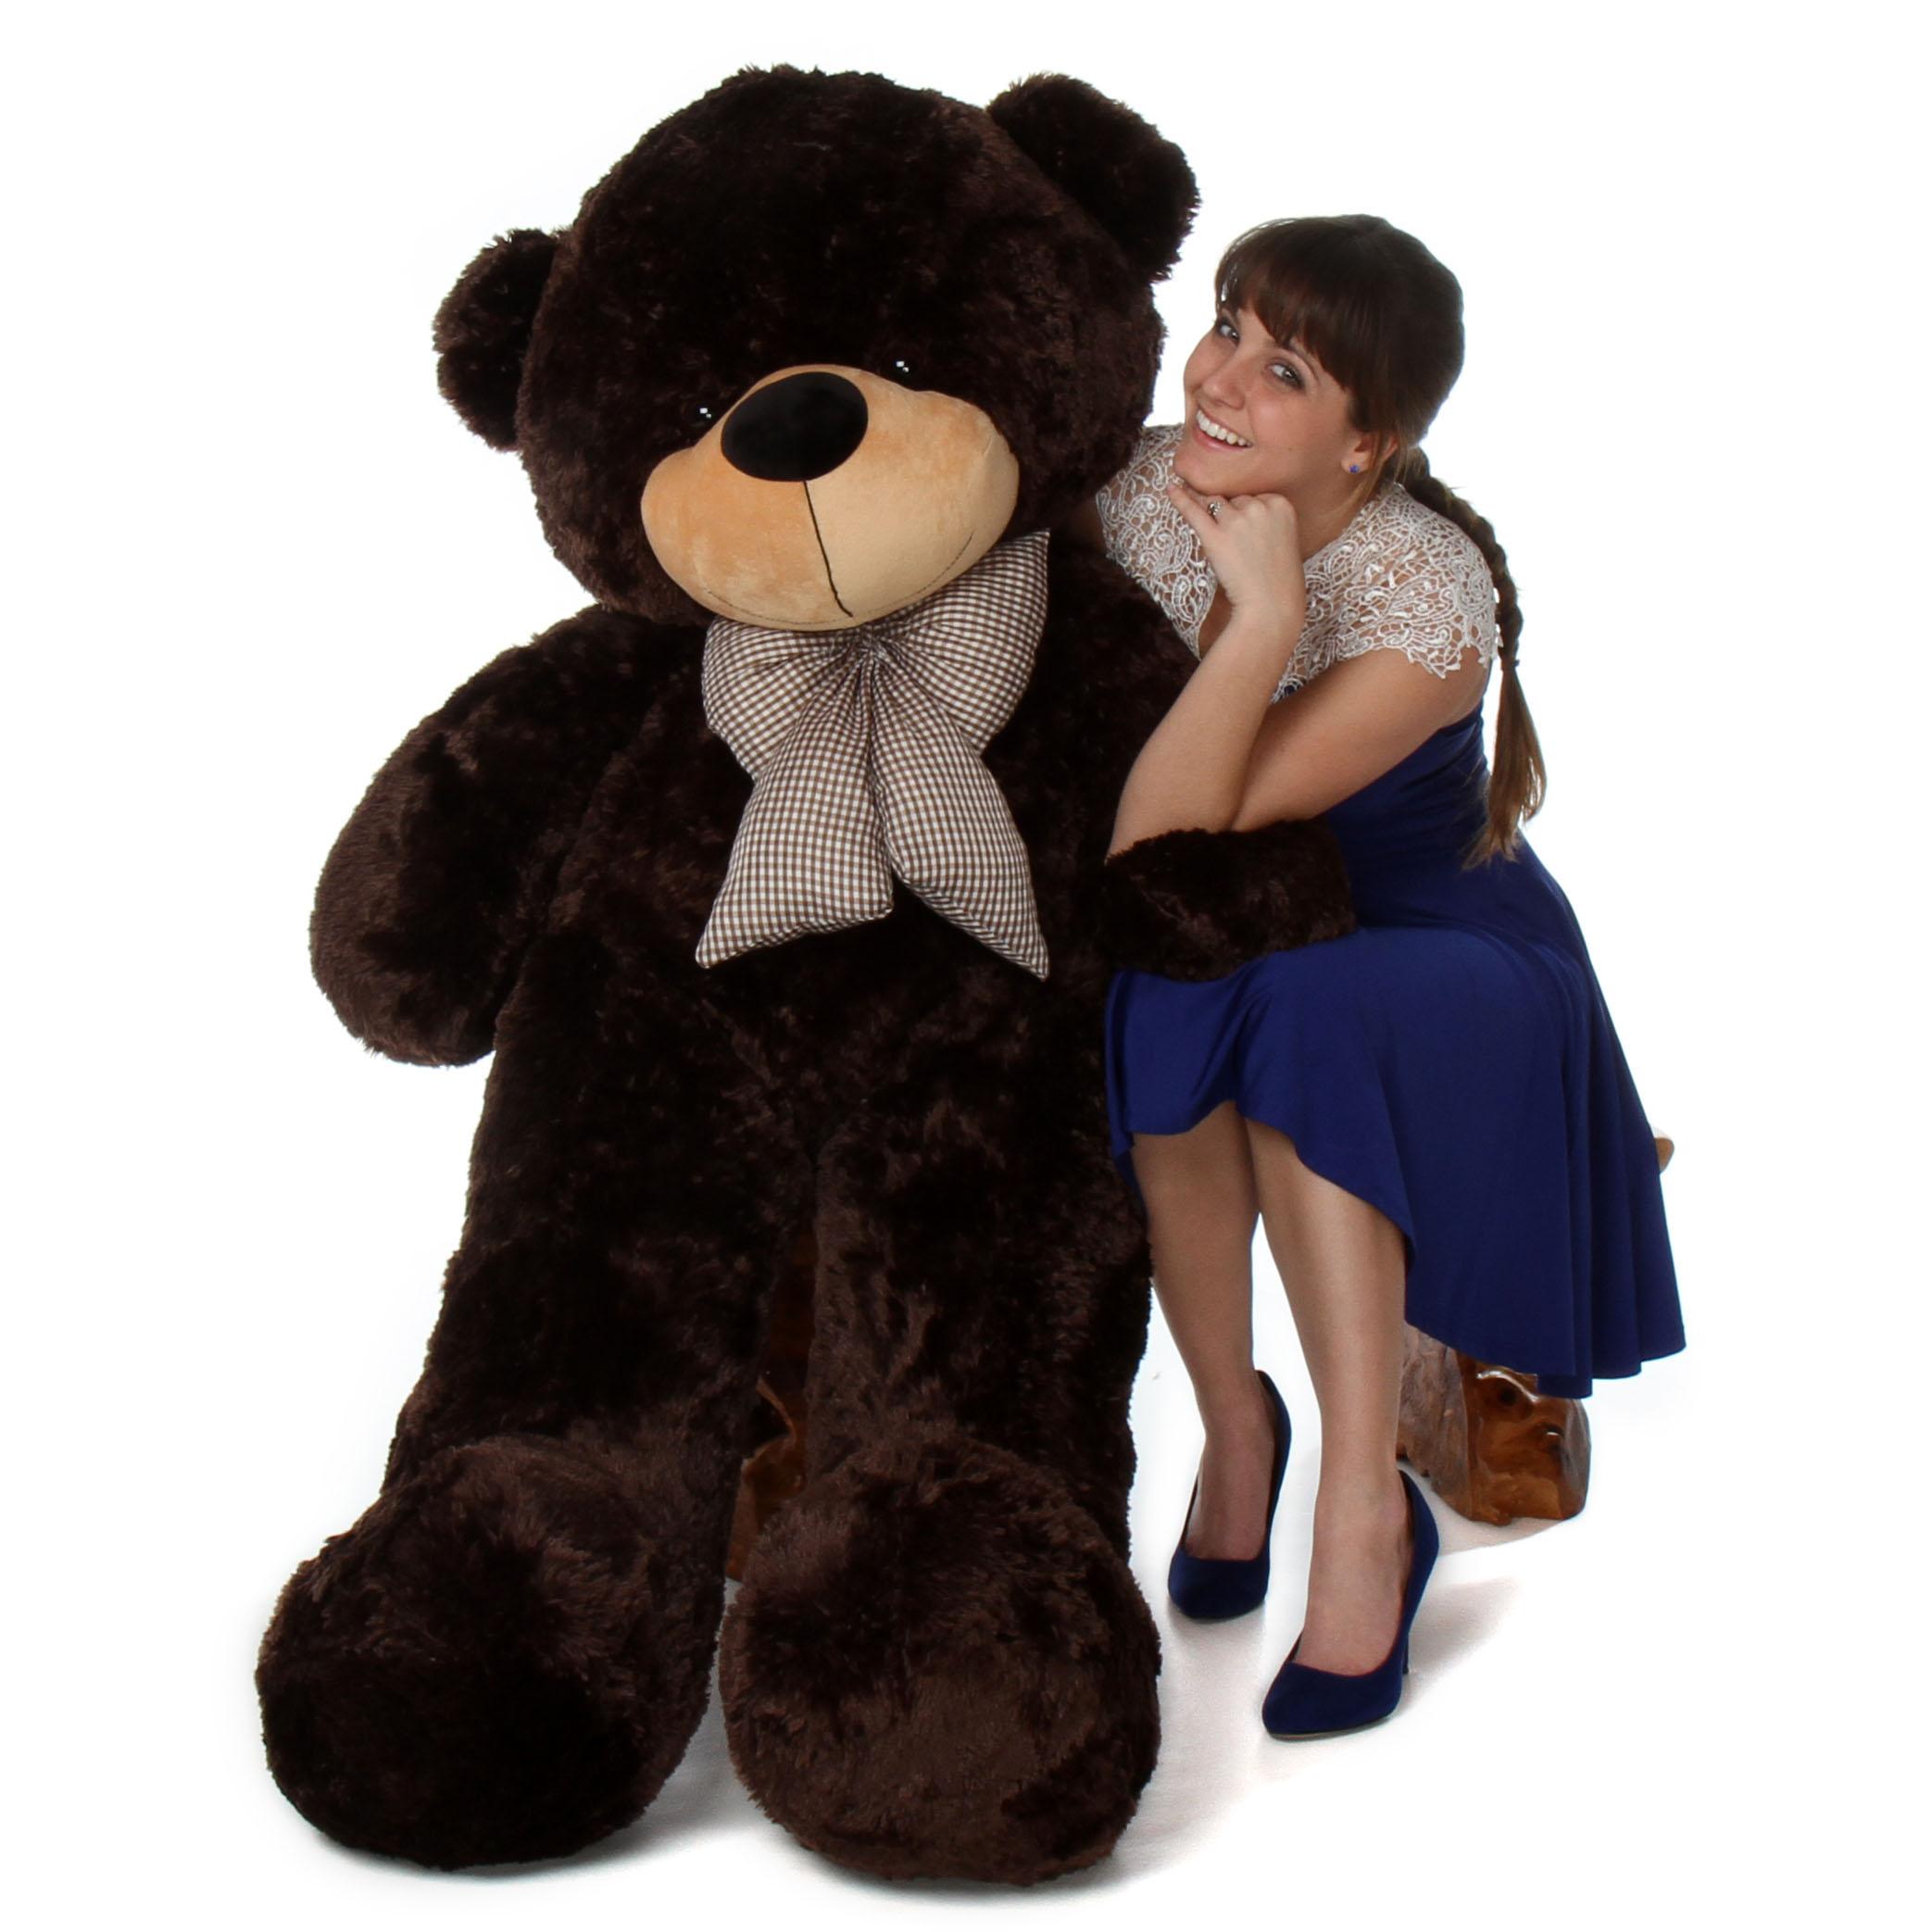 5ft-life-size-jumbo-teddy-bear-brownie-cuddles-softest-dark-chocolate-brown-fur.jpg